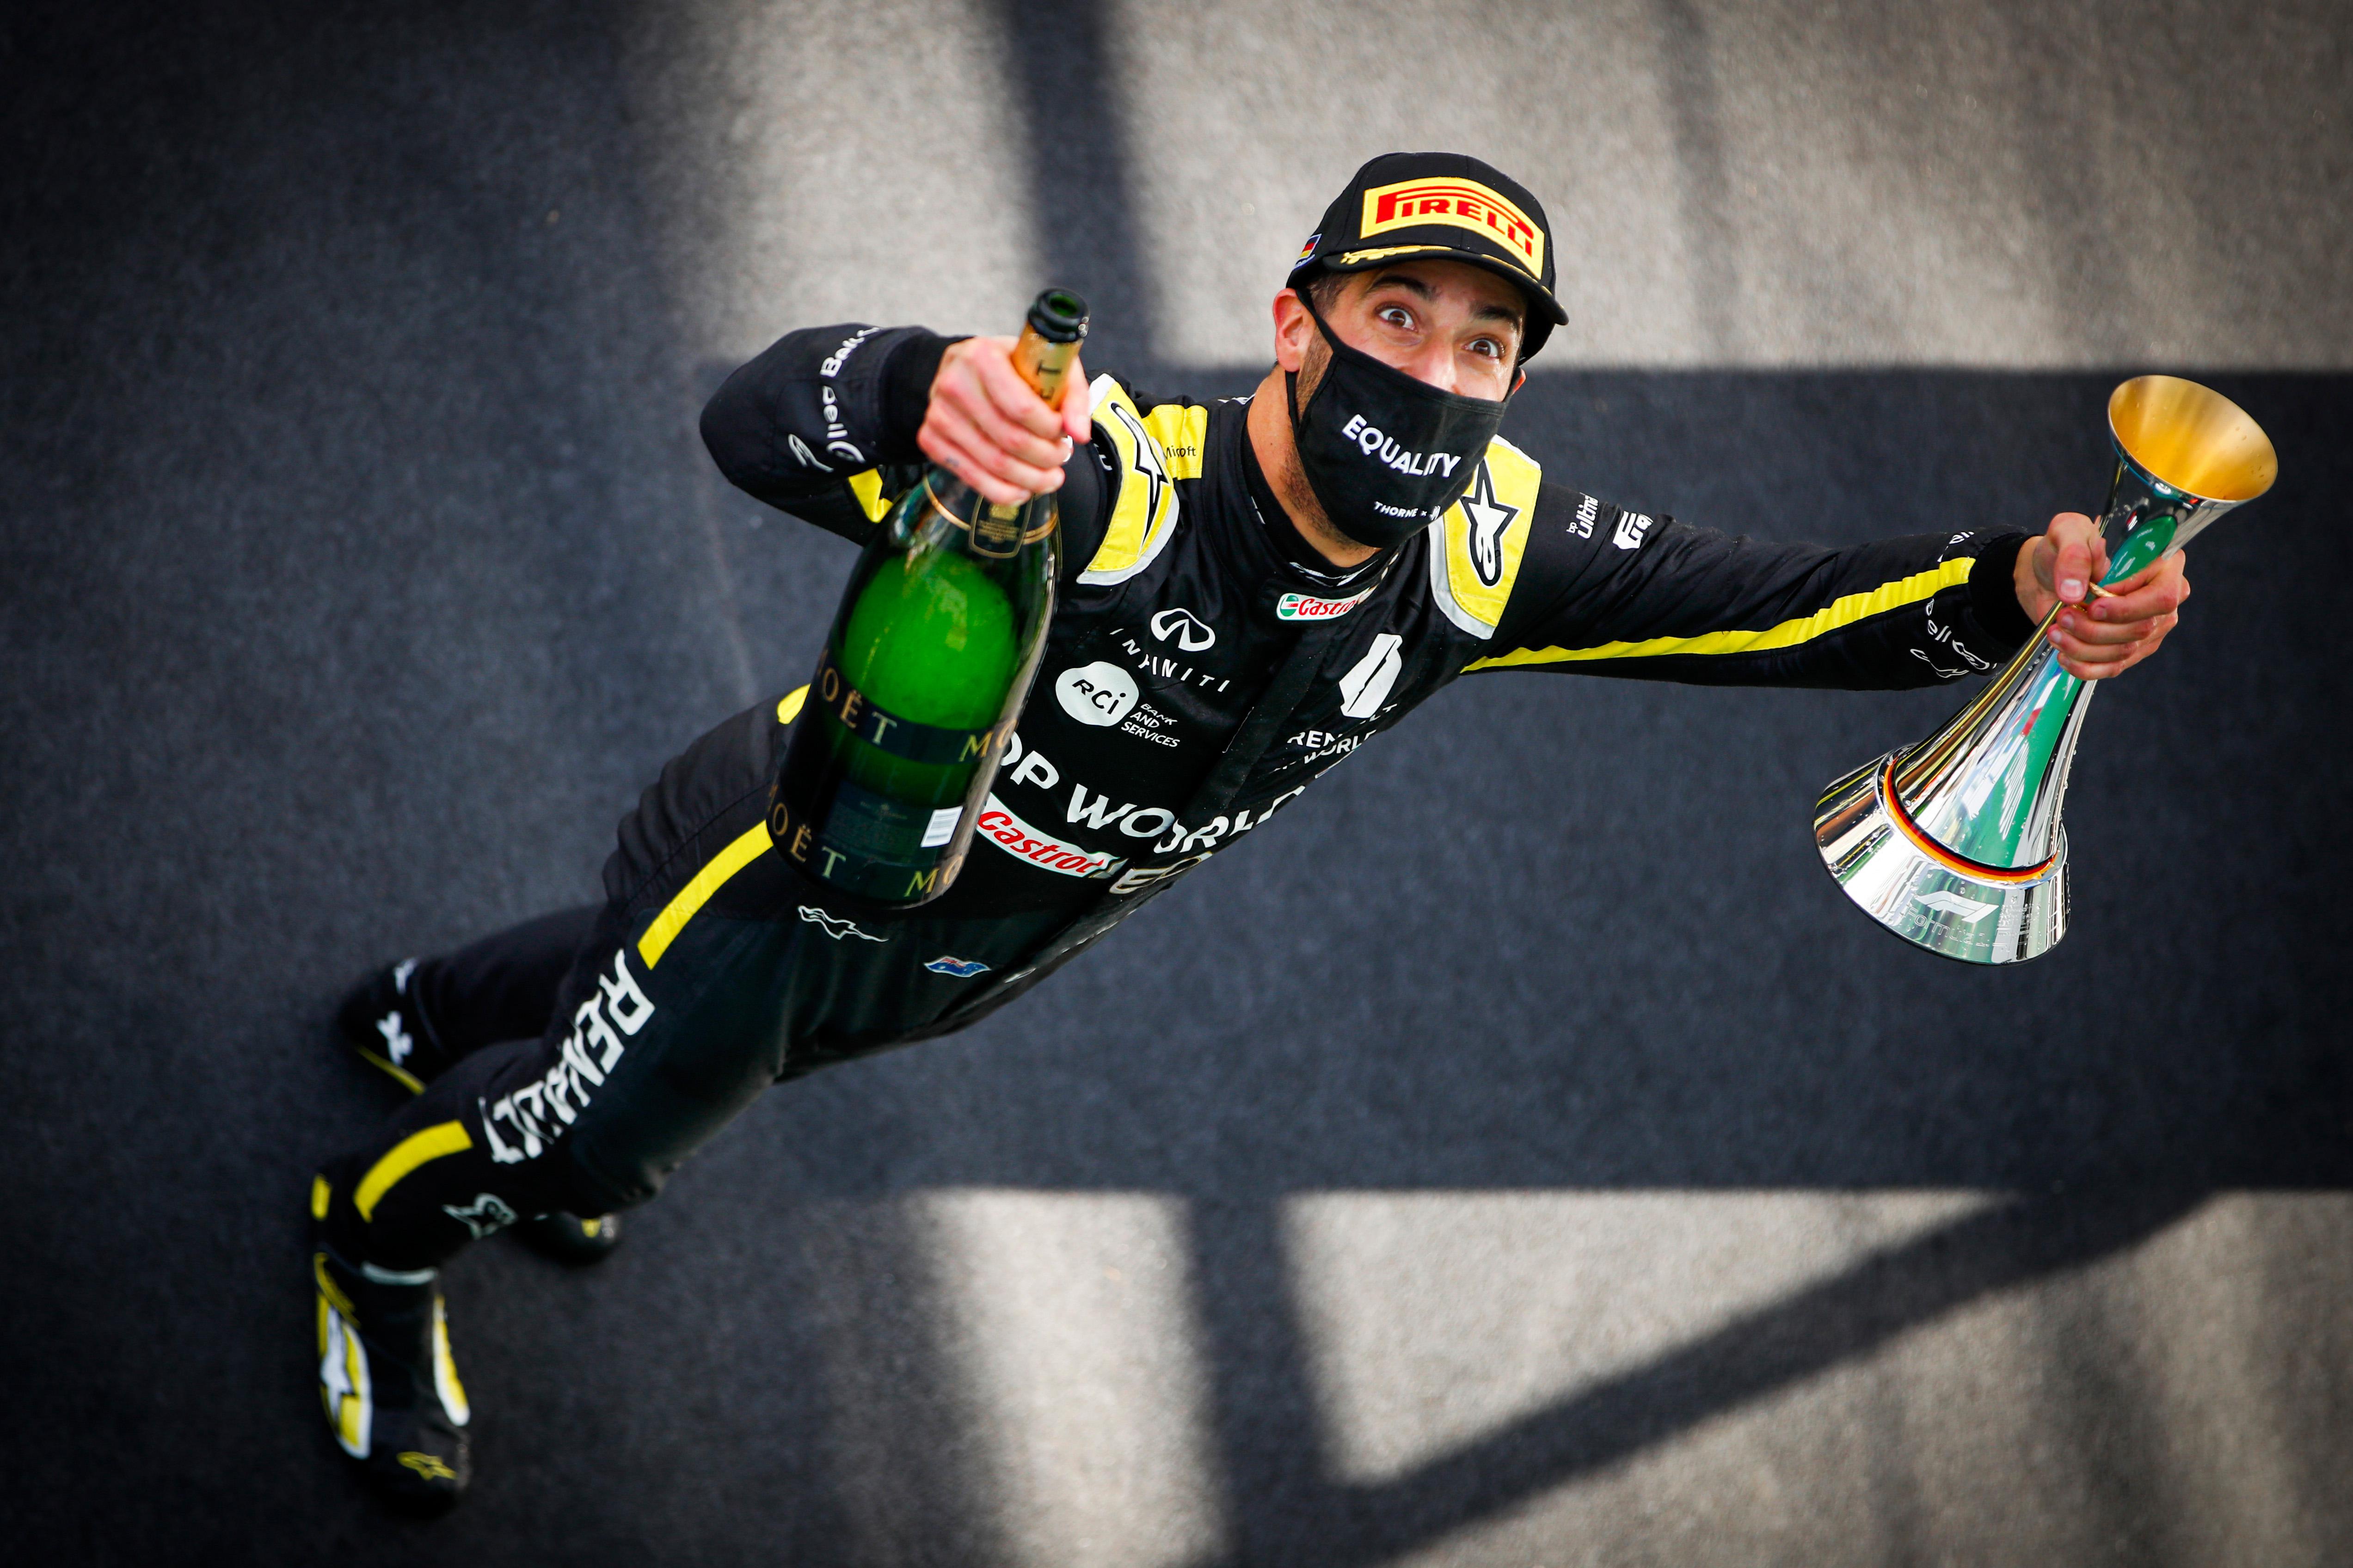 What Ricciardo S Breakthrough Podium Really Says About Renault The Race